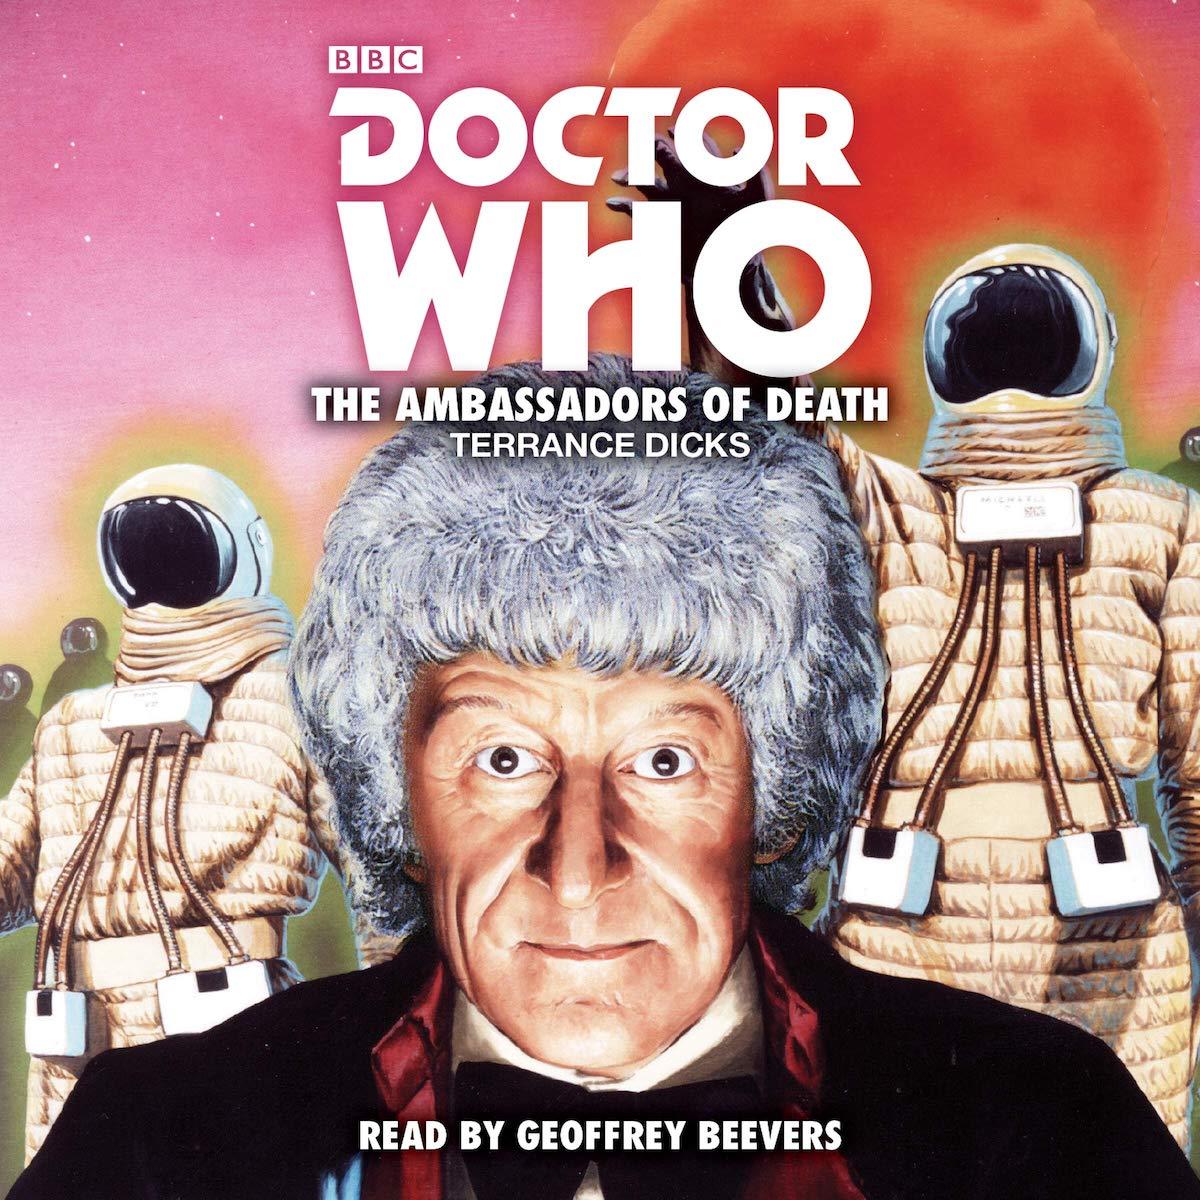 The Ambassadors of Death